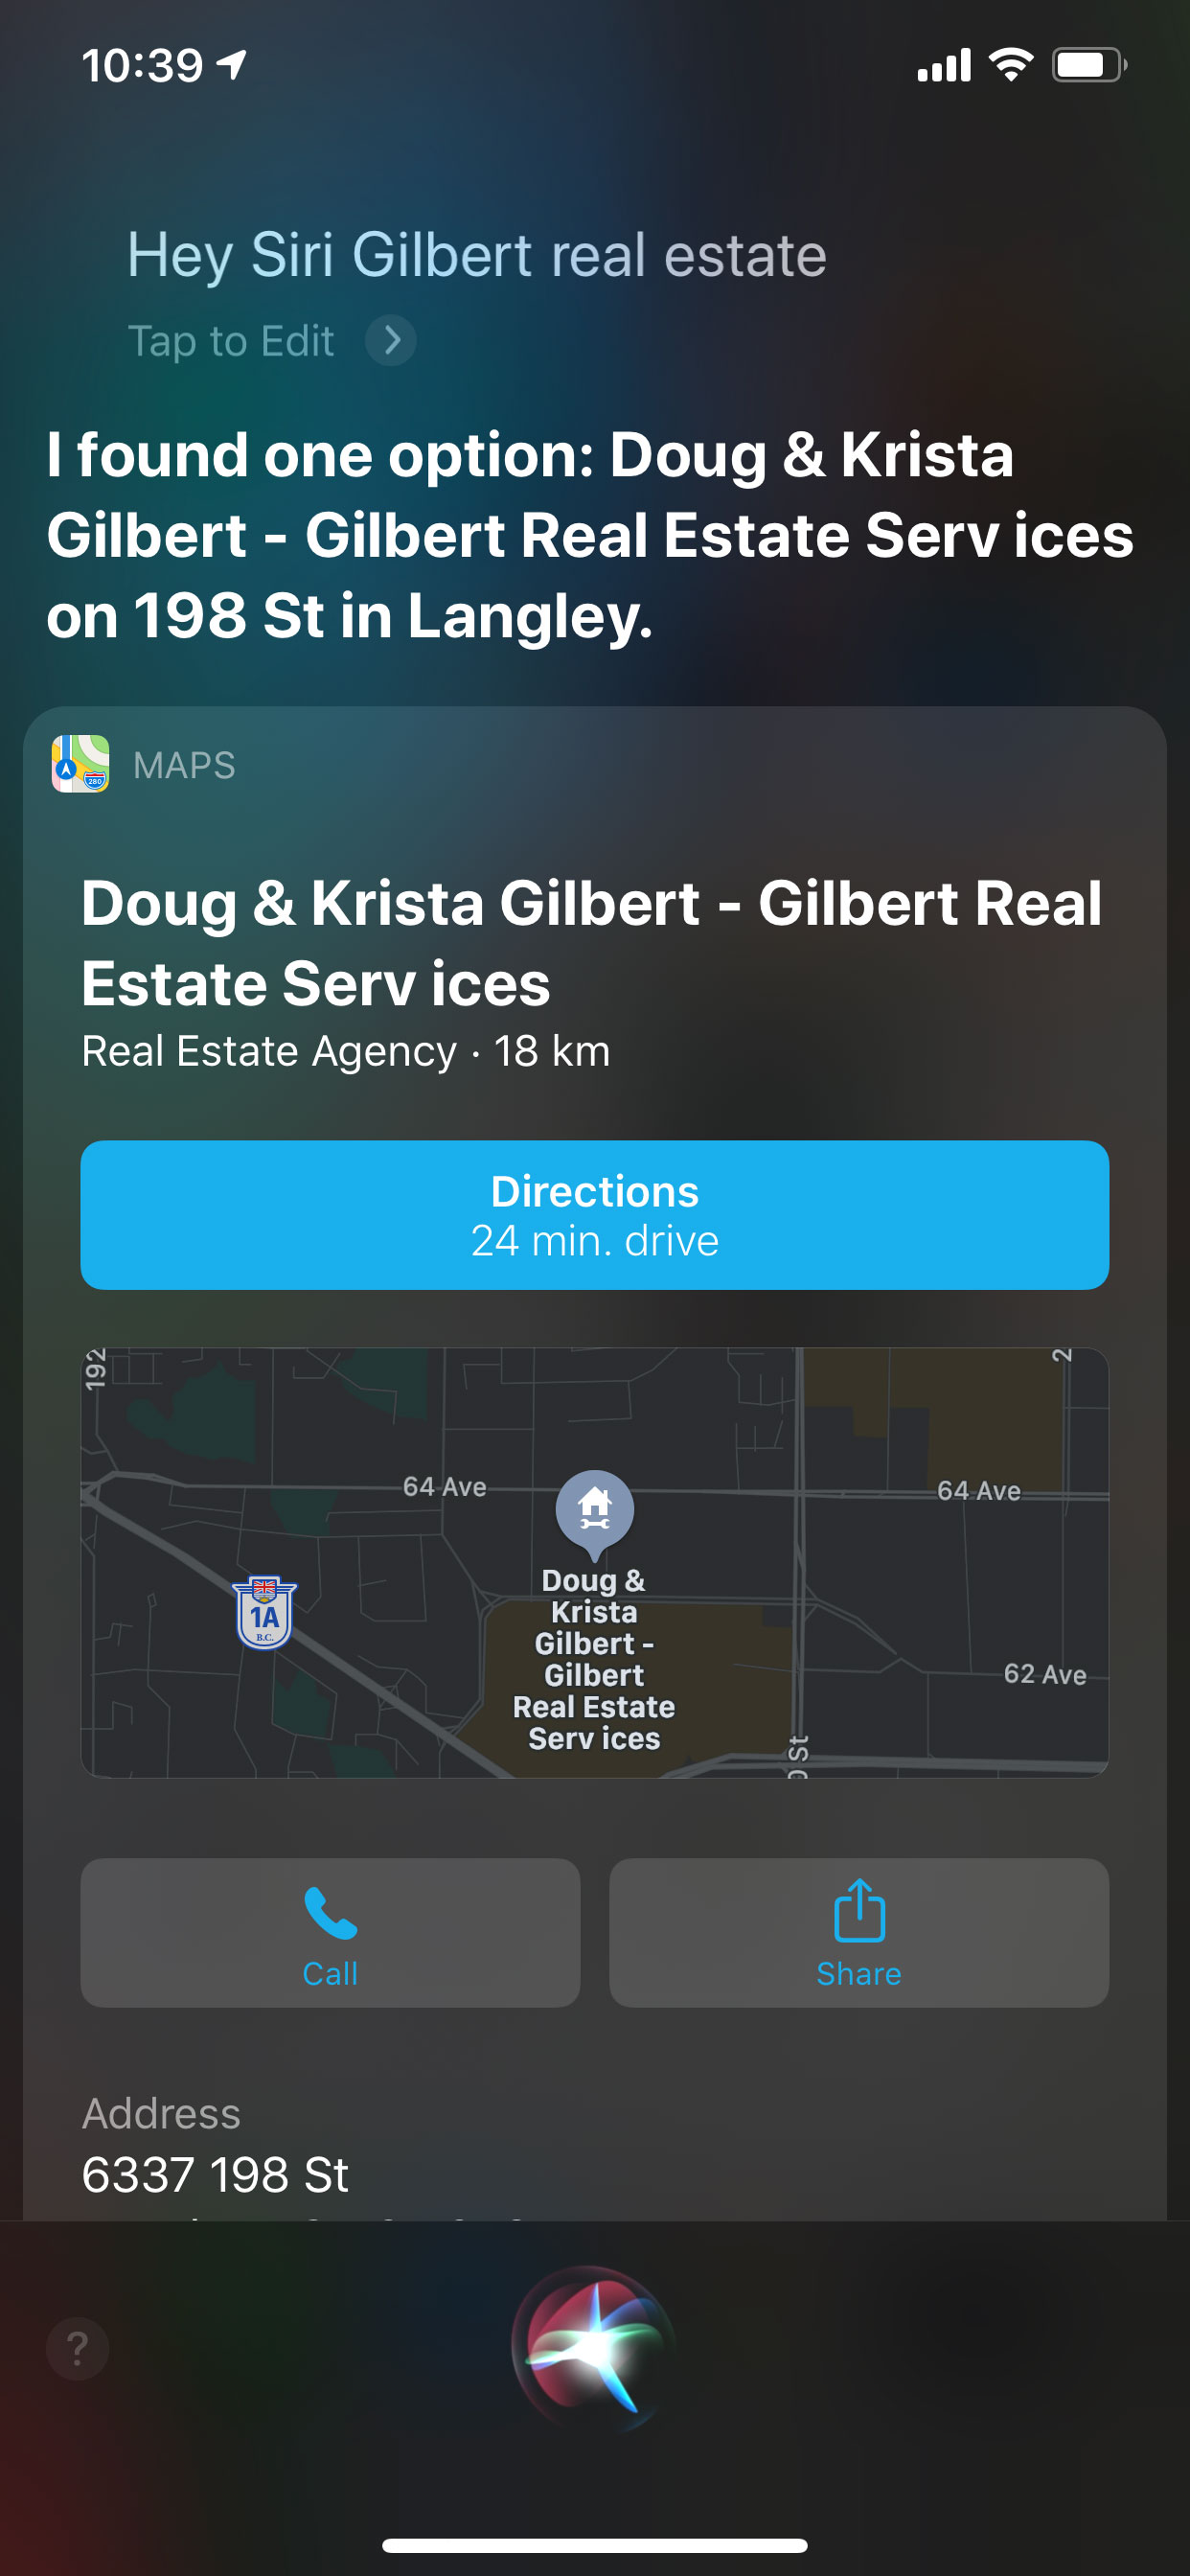 Voice Search - Doug & Krista Gilbert Real Estate Services